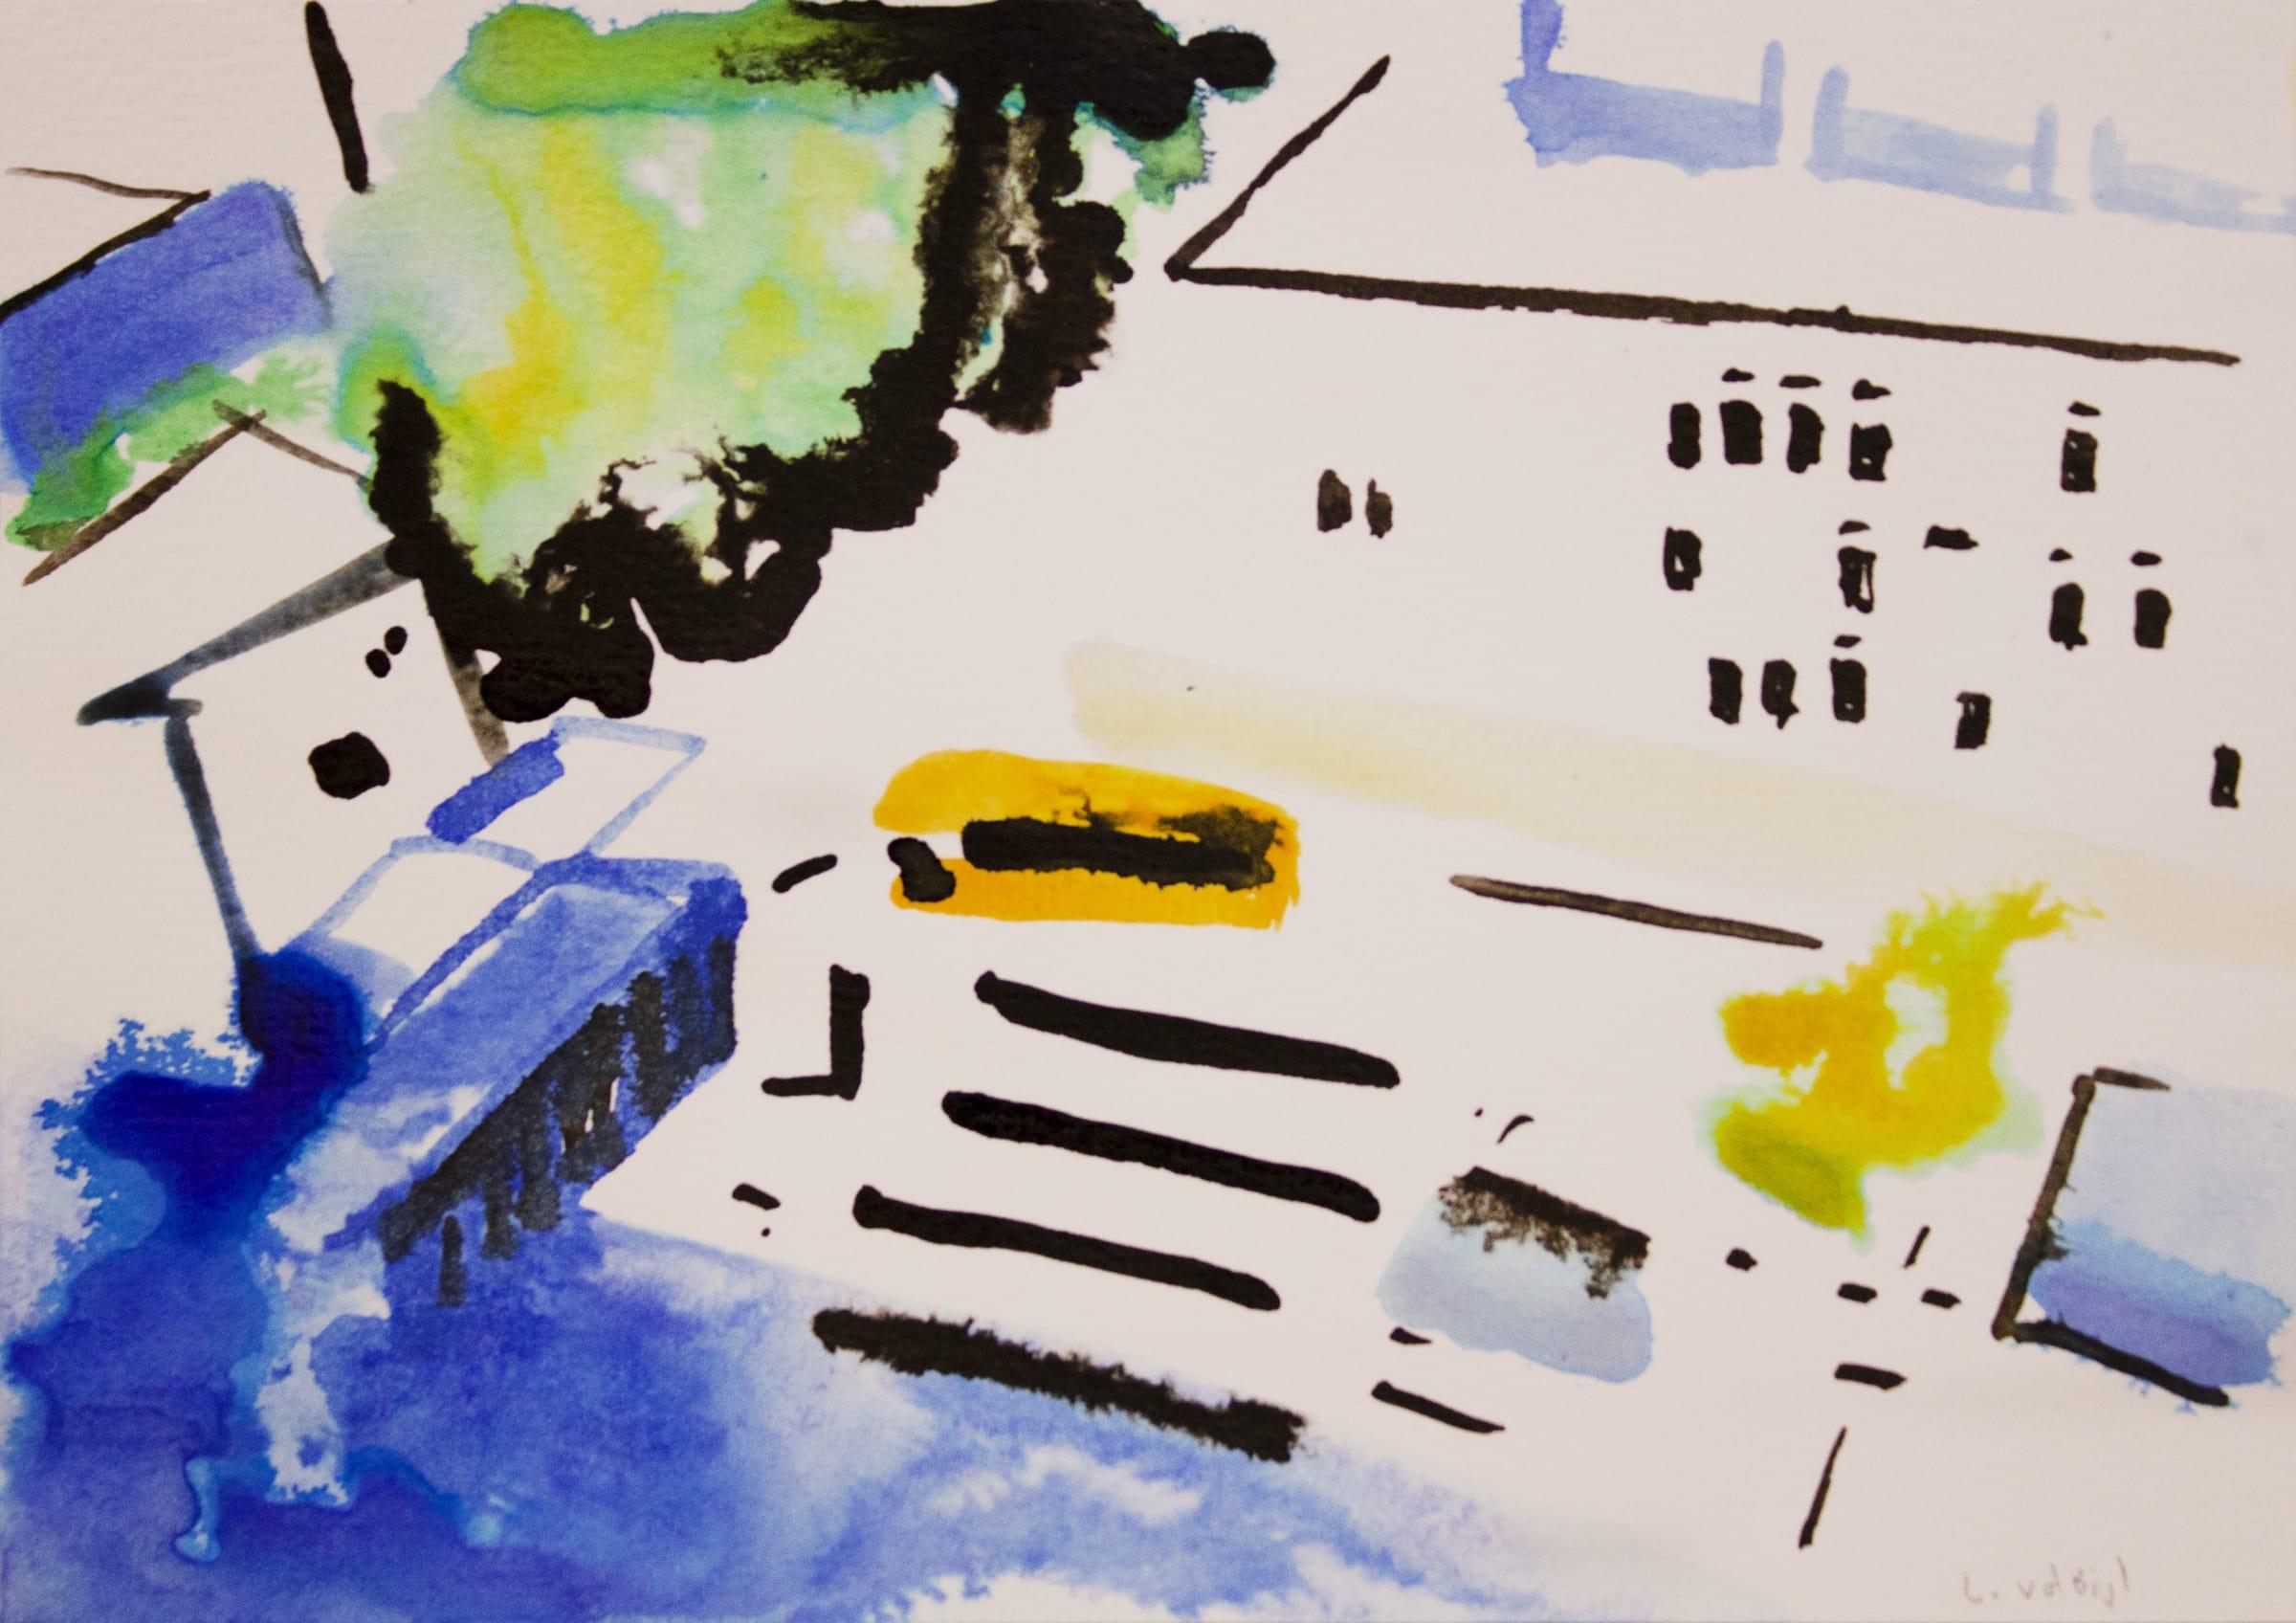 <span class=&#34;link fancybox-details-link&#34;><a href=&#34;/artists/88-louise-van-der-bijl/works/2293-louise-van-der-bijl-inktober-day-3-2018/&#34;>View Detail Page</a></span><div class=&#34;artist&#34;><strong>Louise Van Der Bijl</strong></div> <div class=&#34;title&#34;><em>Inktober Day 3</em>, 2018</div> <div class=&#34;medium&#34;>Ink On Paper</div> <div class=&#34;dimensions&#34;>14.9cm x 21.1cm</div><div class=&#34;price&#34;>R400.00</div>